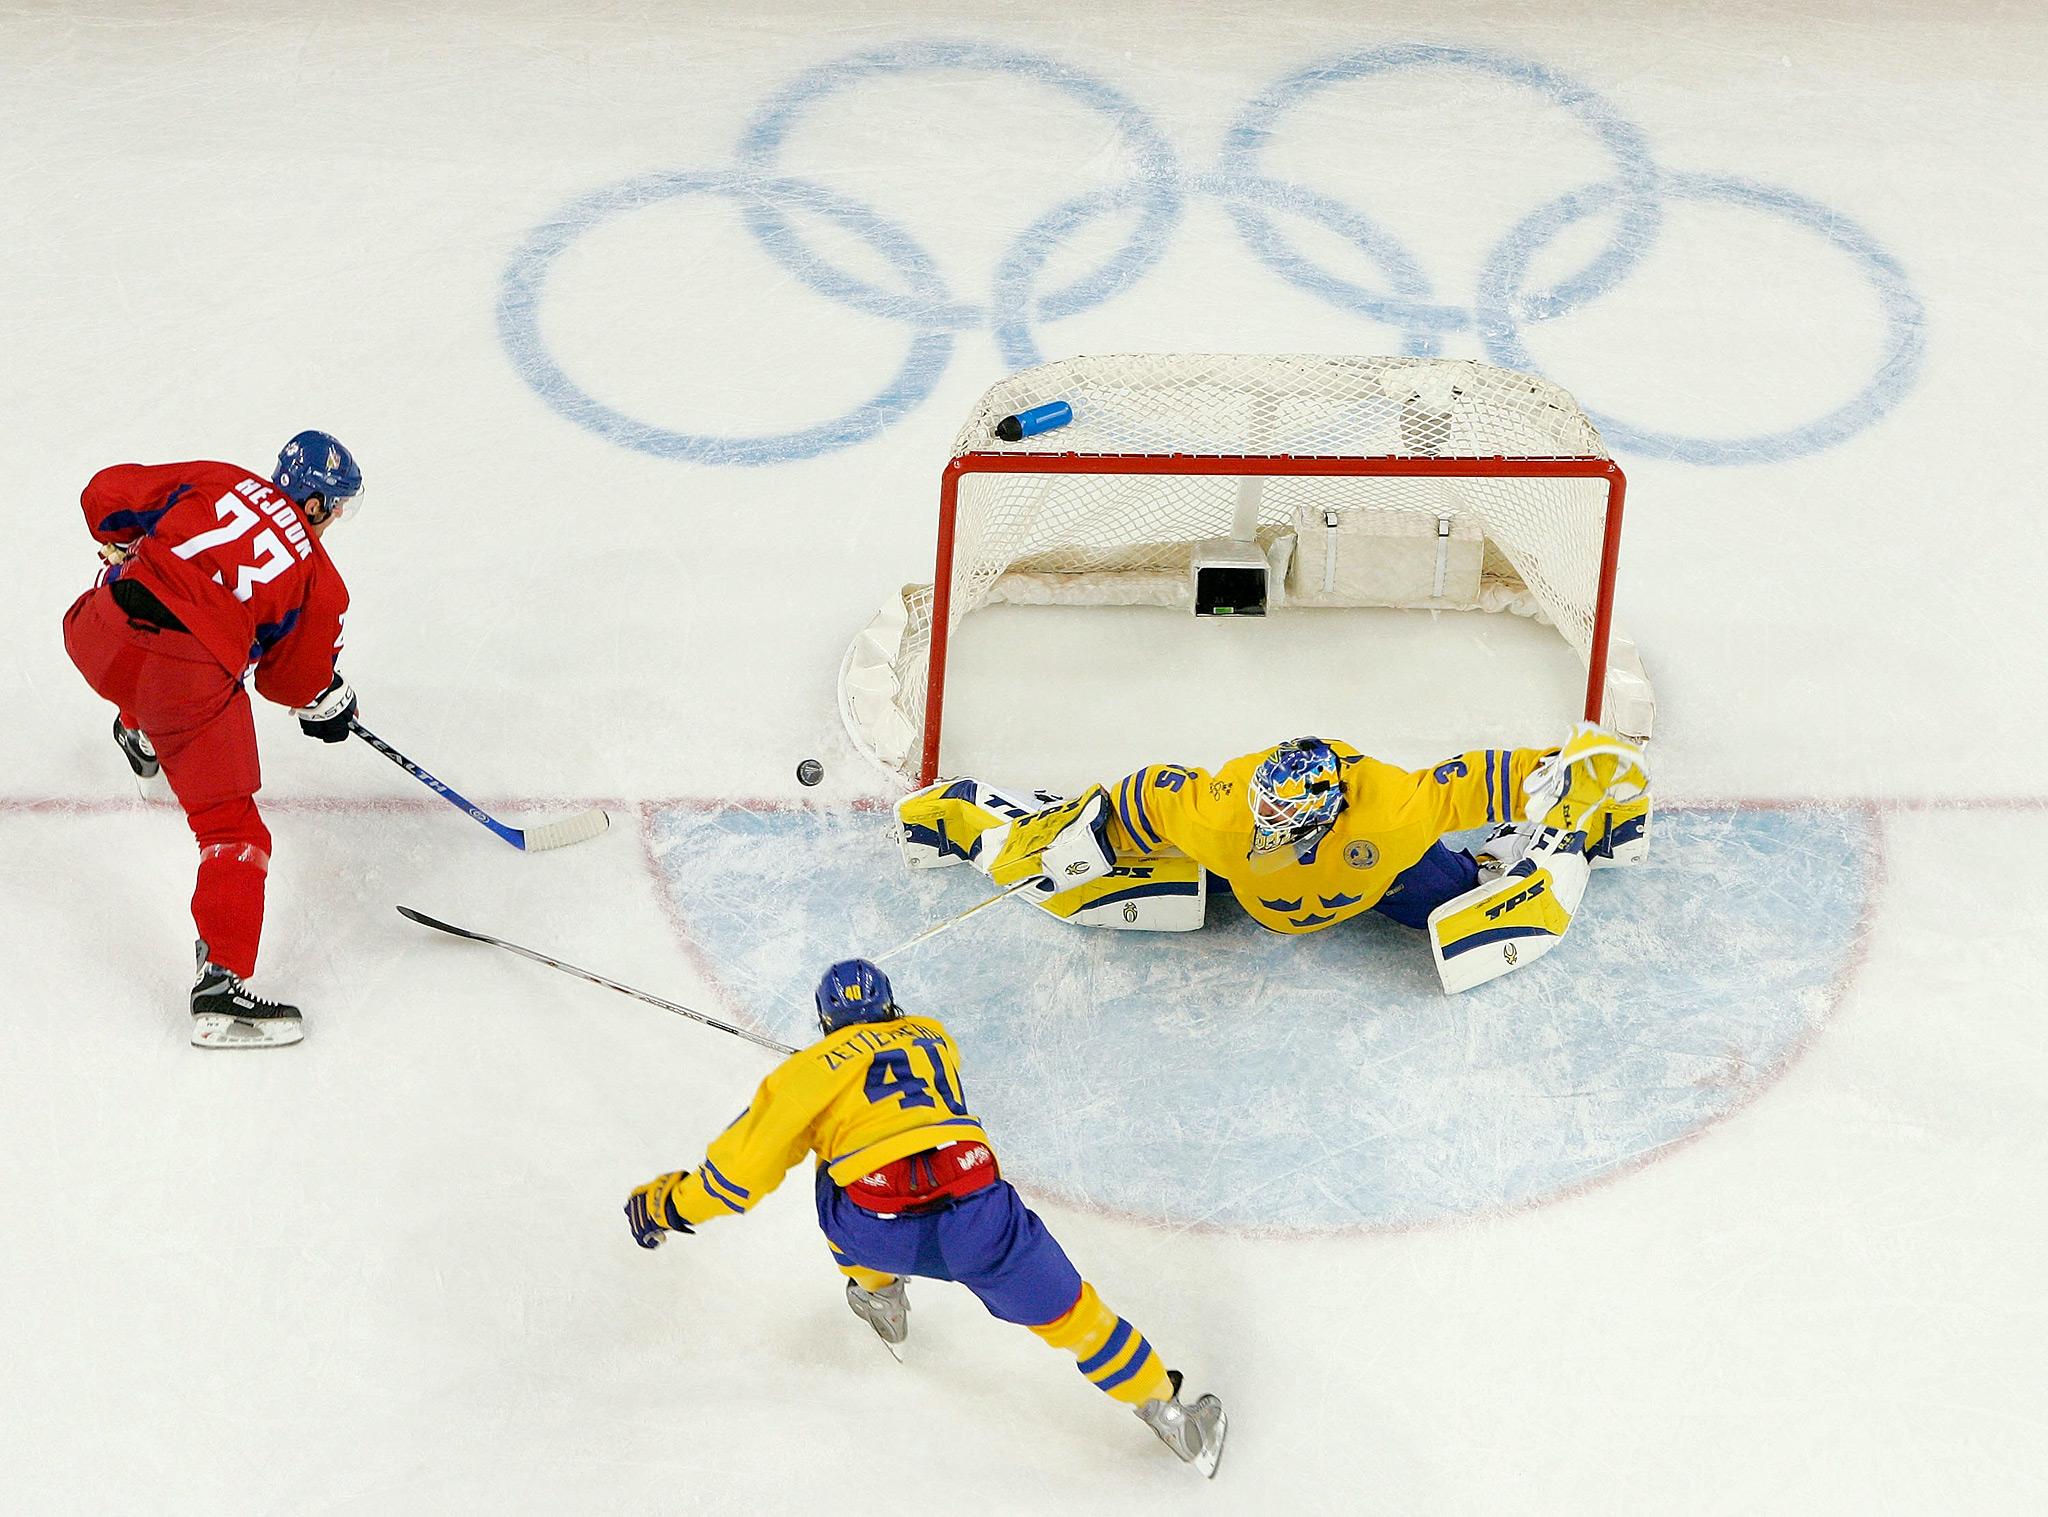 2006 Turin Games